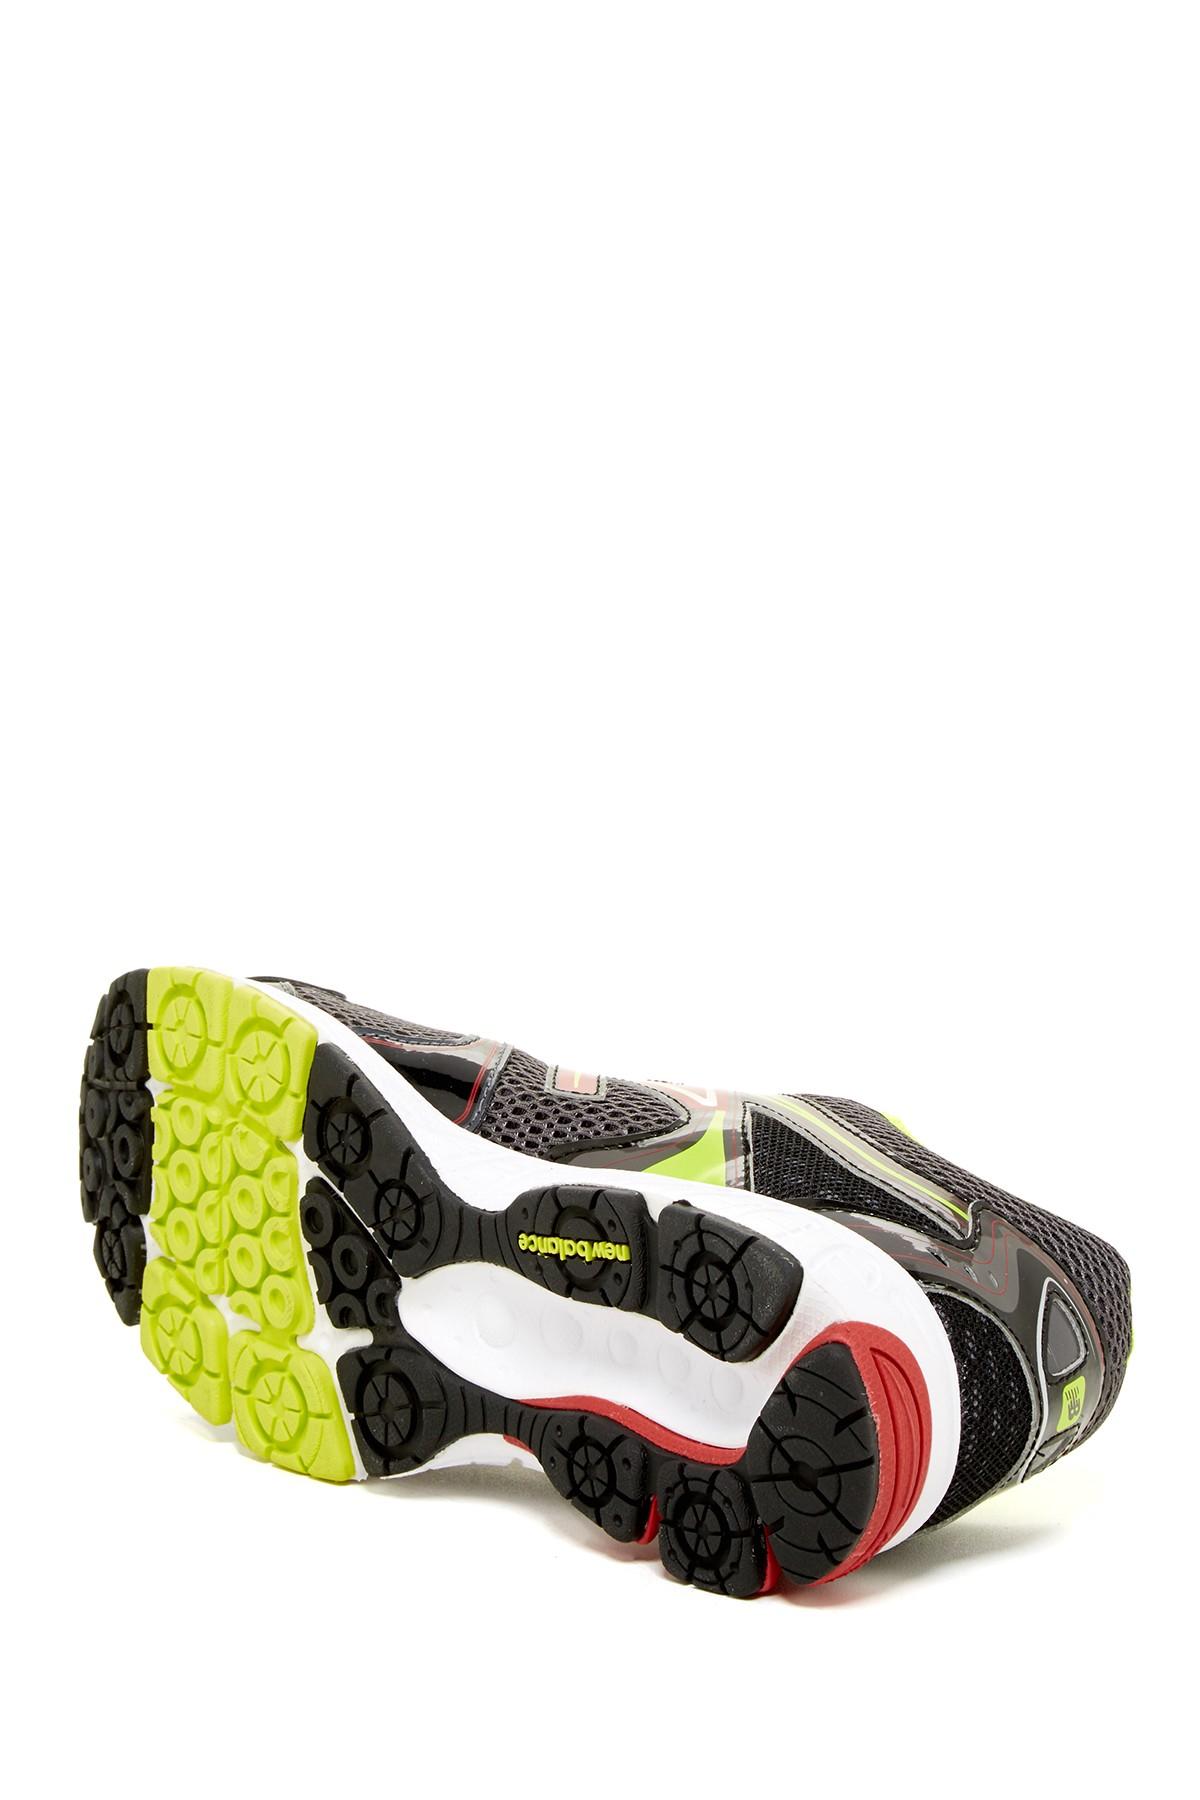 the latest 942ac 0ae67 New Balance Multicolor 580v4 Running Shoe for men